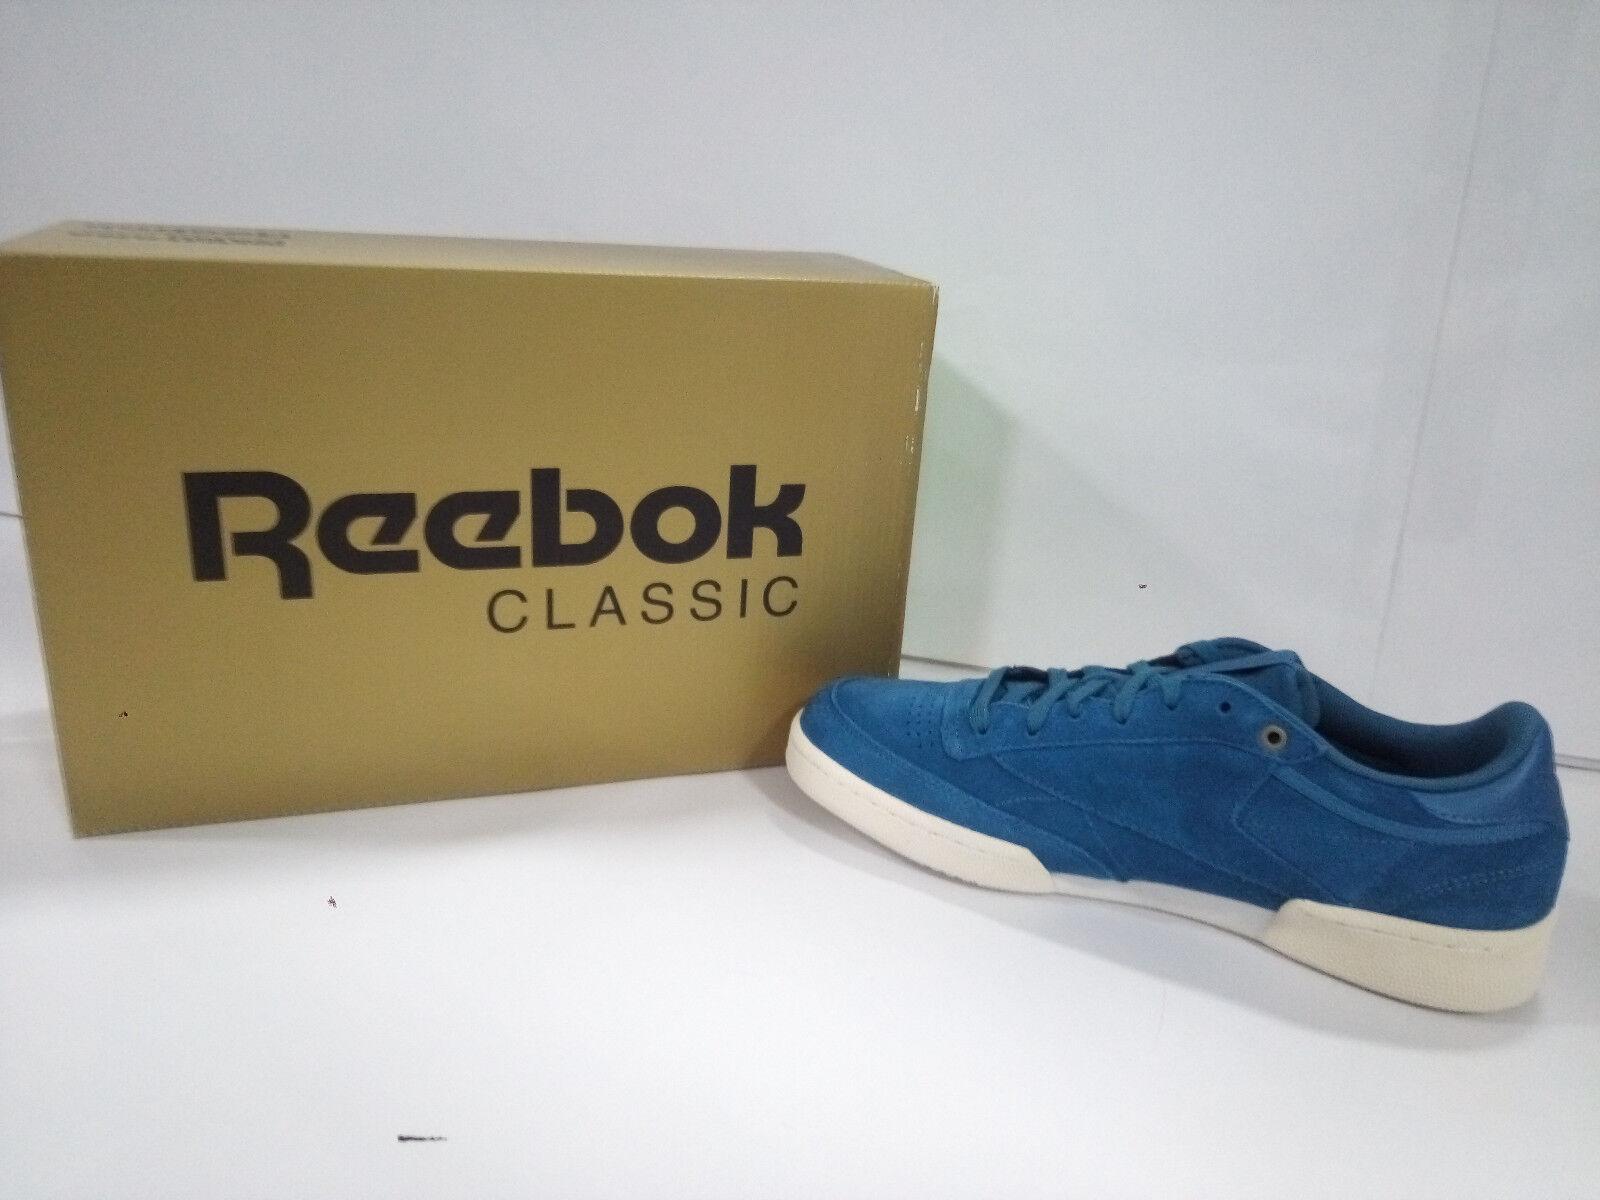 Reebok Uomo - Club C C C 85 - Avio - CM9295 618fbf